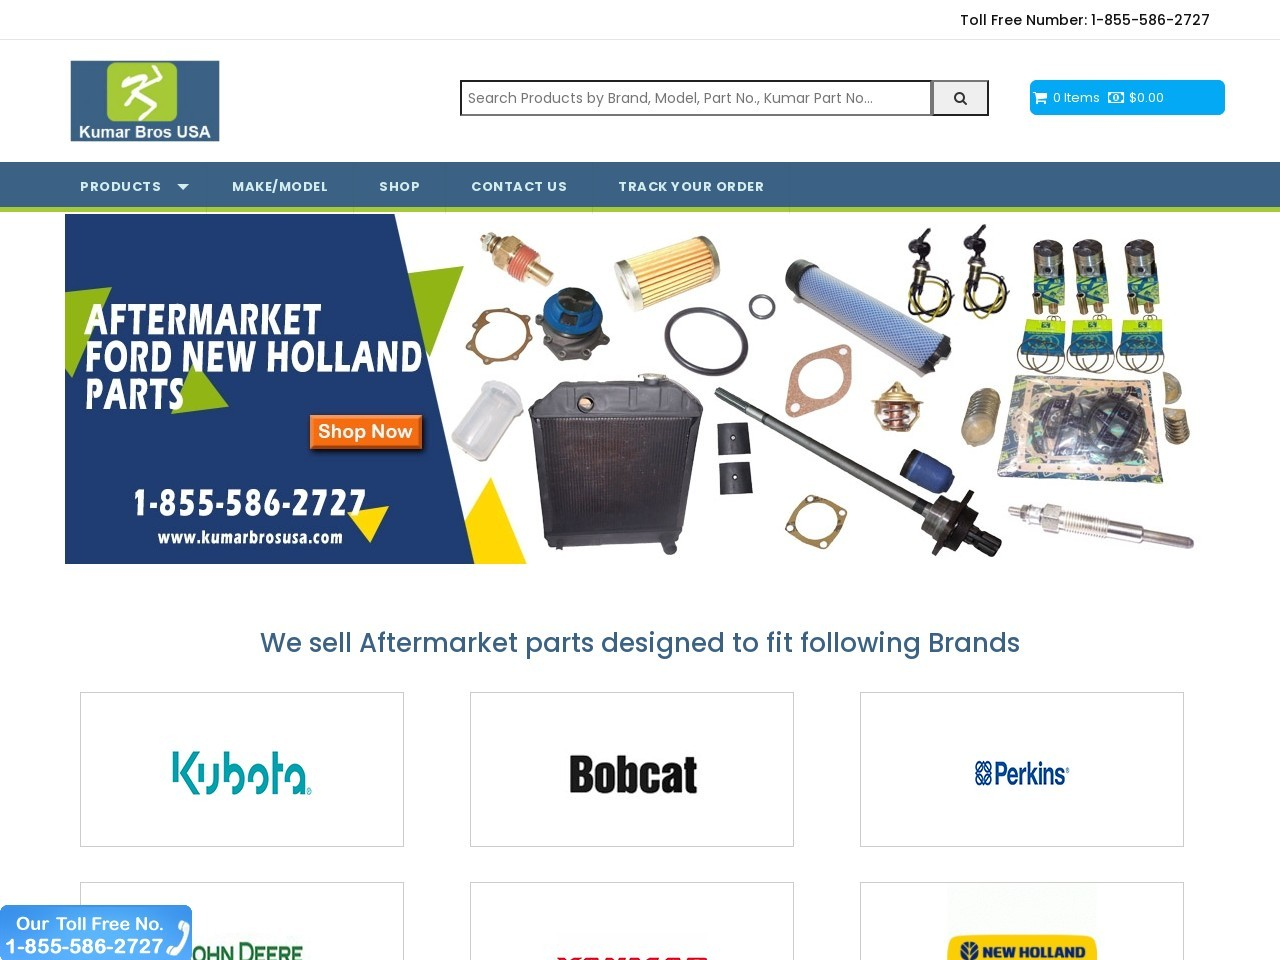 New Kumar Bros USA Left Side Panel/amp/Decal/ Panel Retaining Clip Kit AM128983 M116143 Fits John De